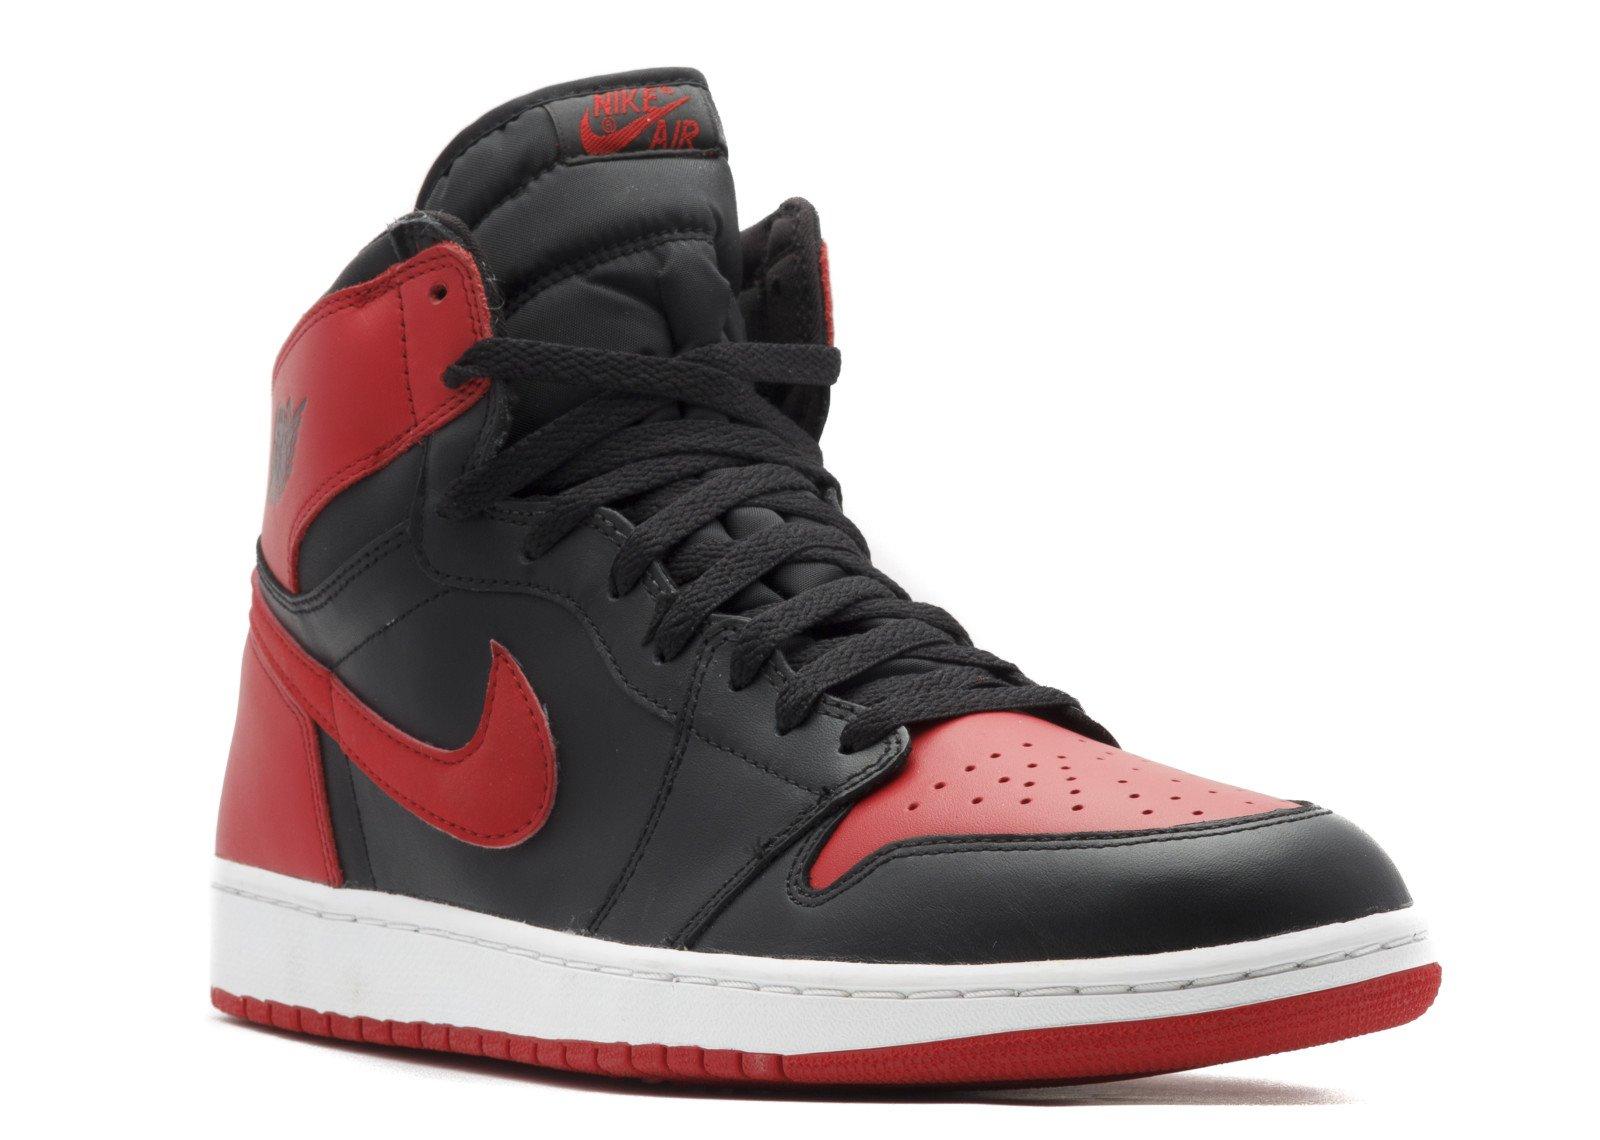 d6d192895b3a1 Nike Womens Flex Trail6166 1600 Sport Trainer Shoes - UKsportsOutdoors